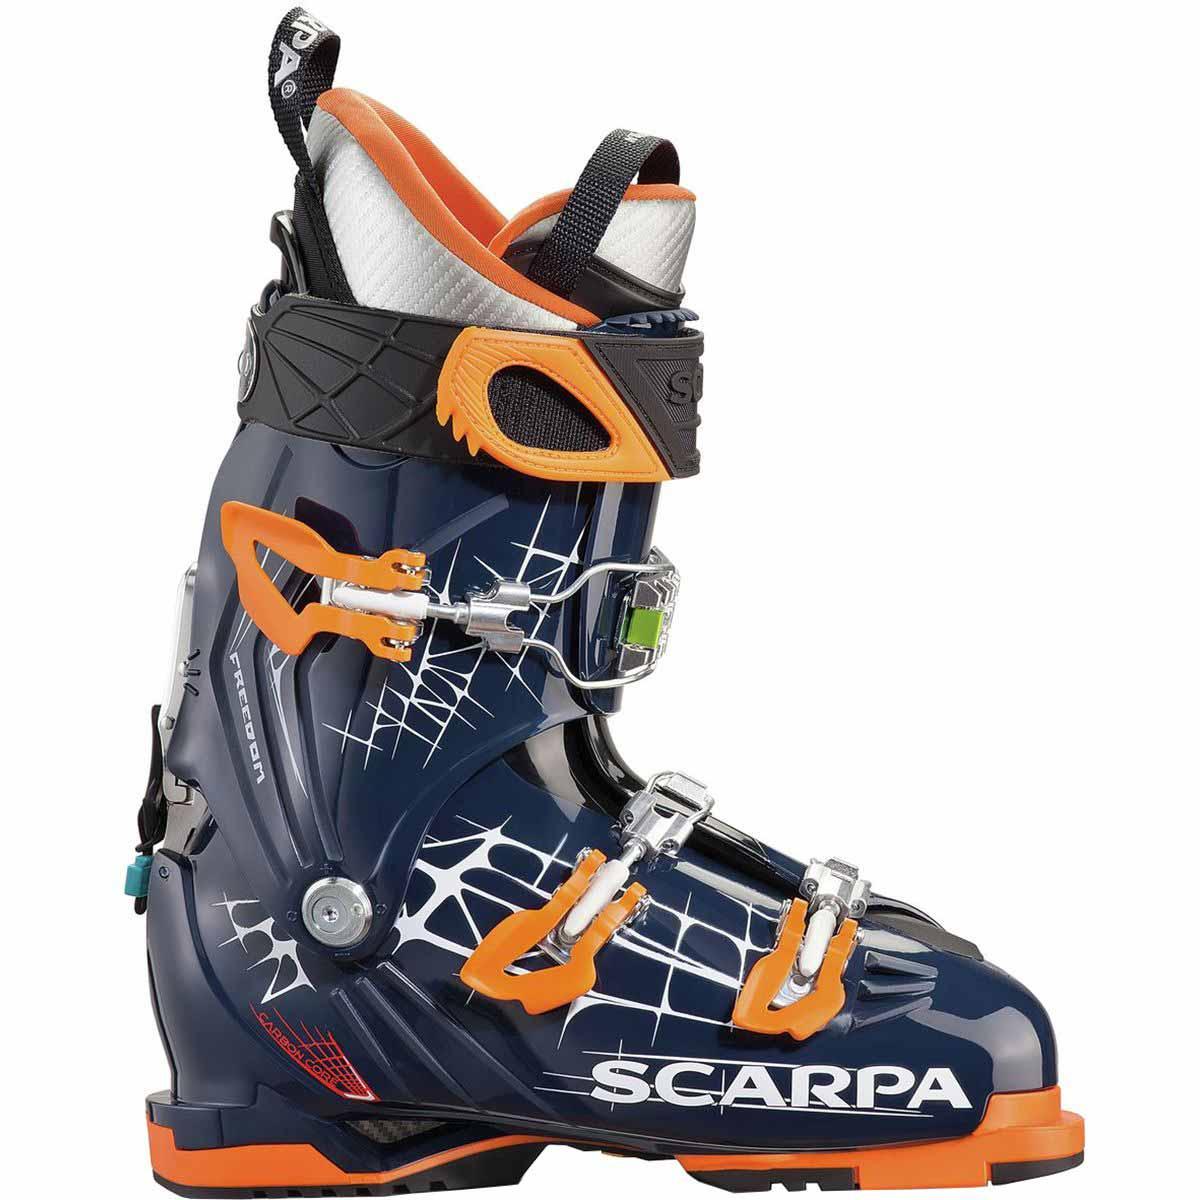 Scarpa Men S Freedom 100 Ski Boots On Sale Powder7 Com